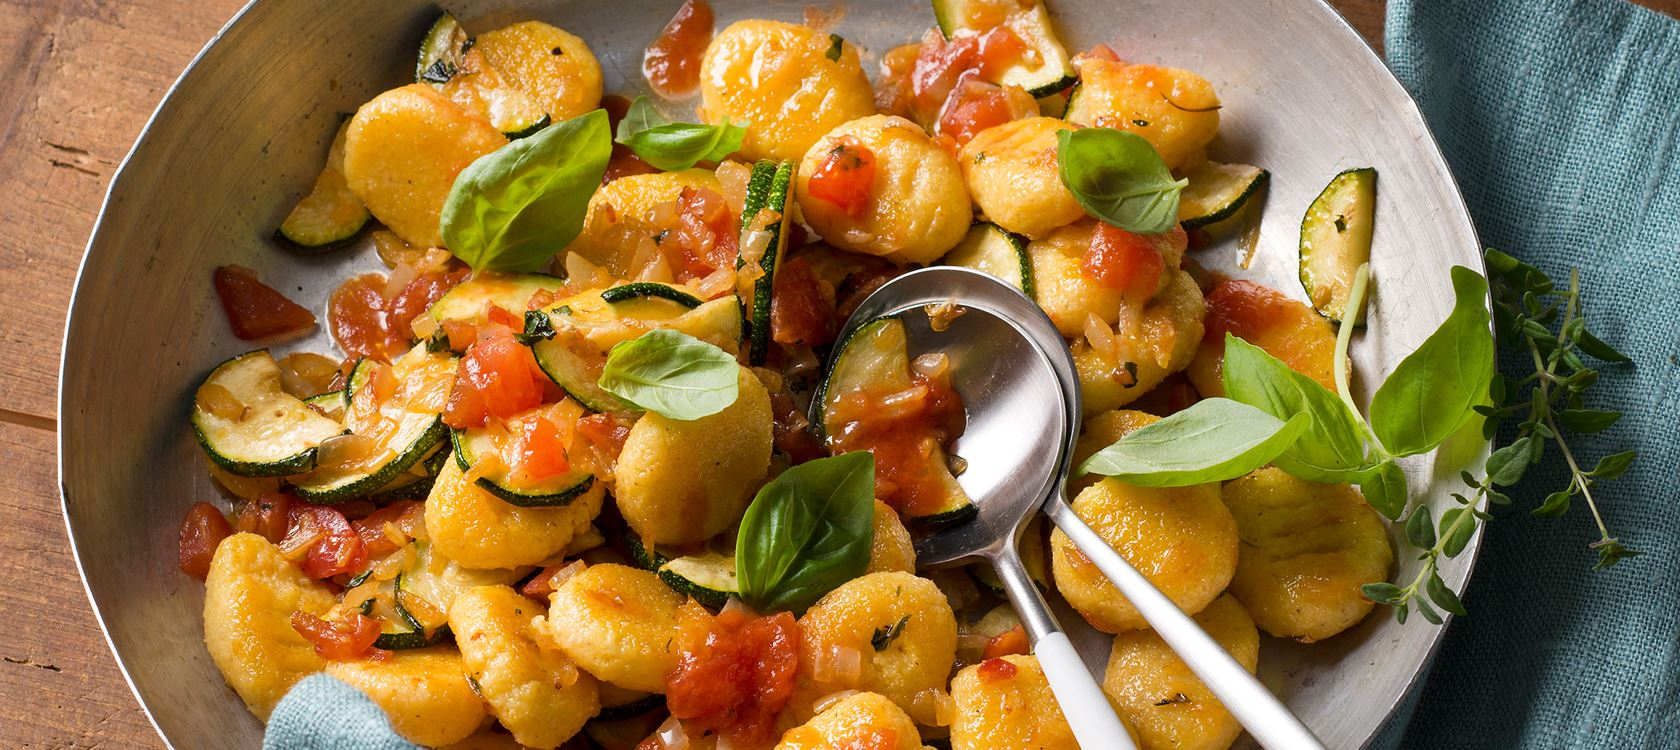 Arla Buko® Der Sahnige-Polenta-Nocken mit Gemüsesauce